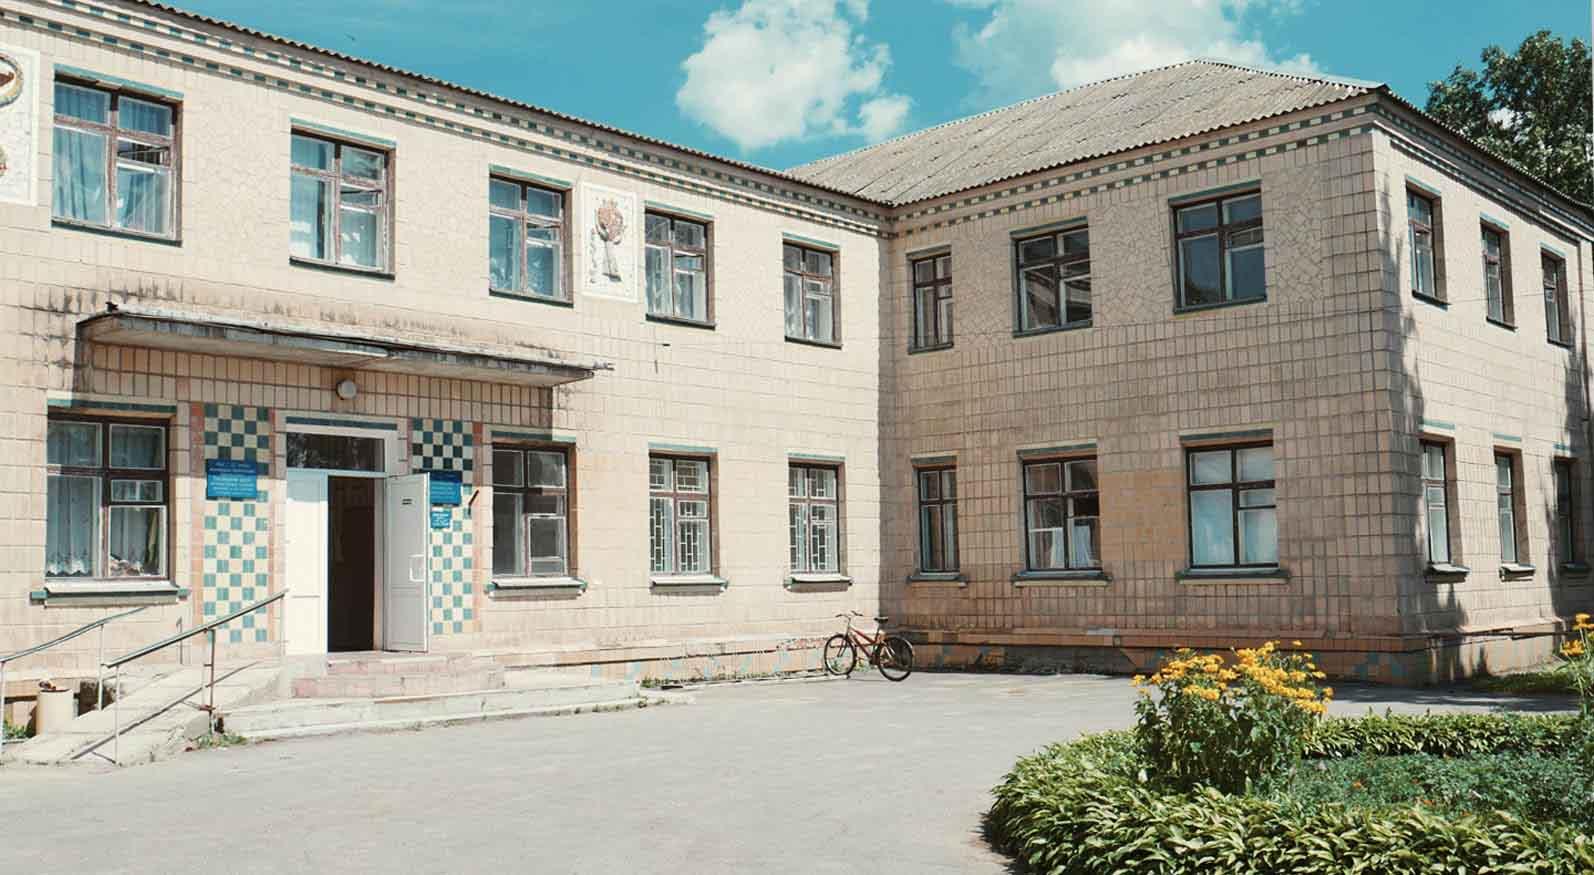 poliklinika 2 Стара Сосниця